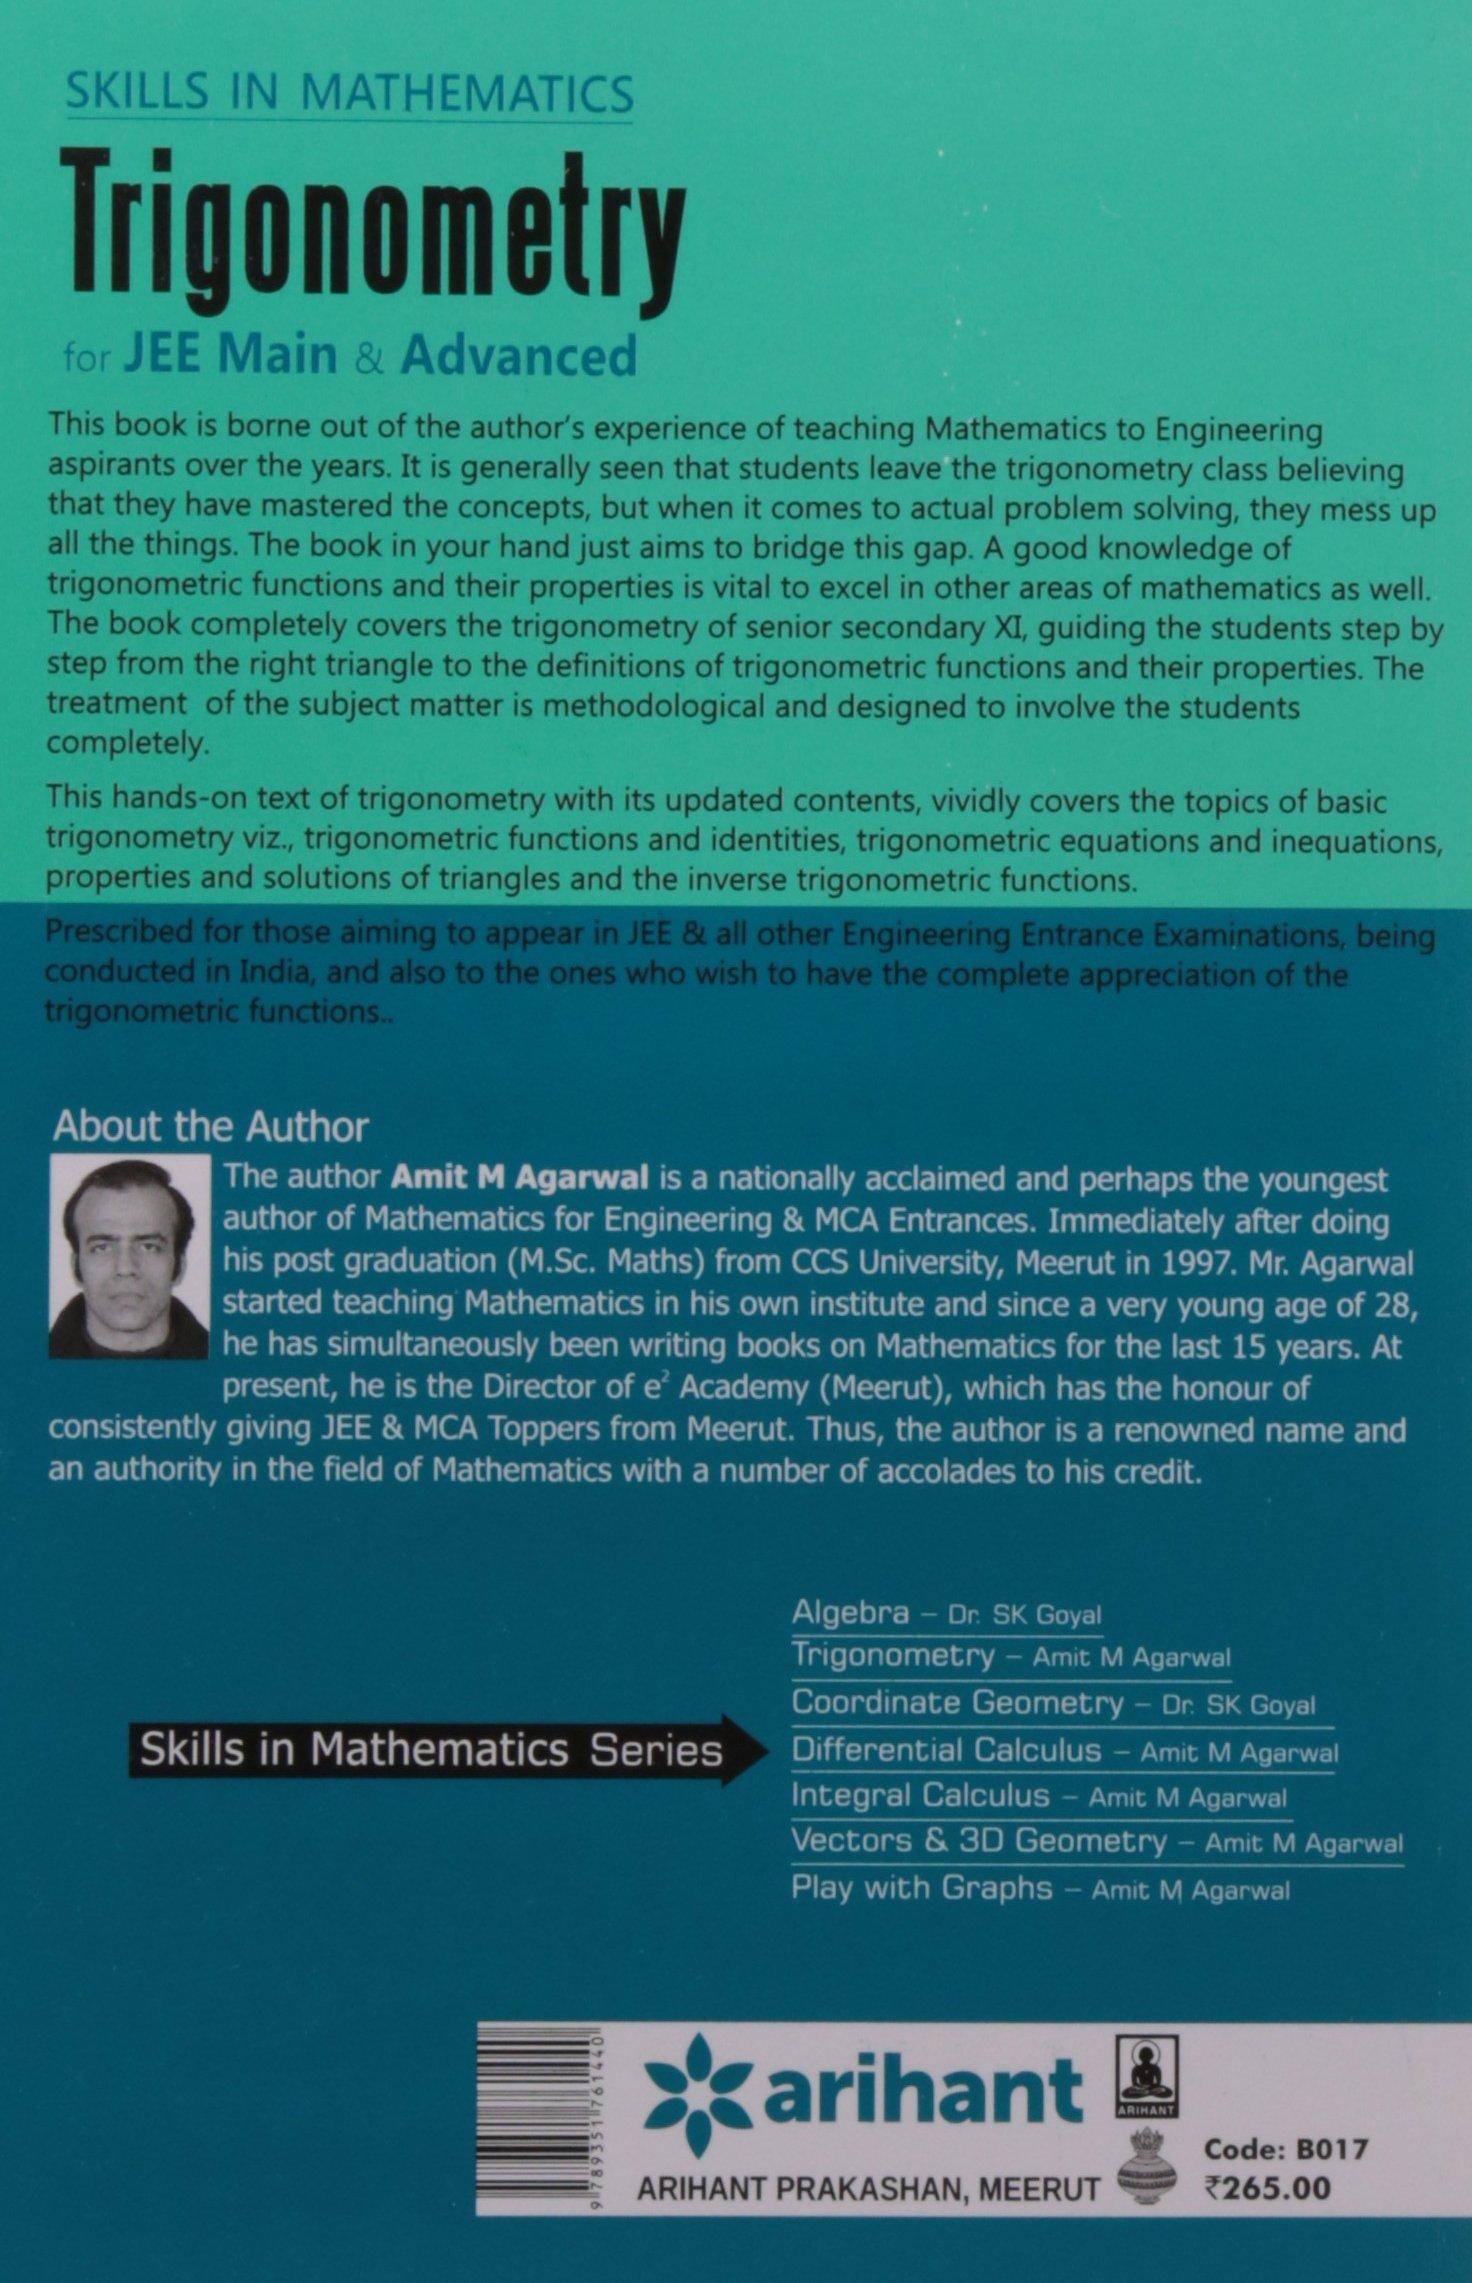 Buy Skills In Mathematics - TRIGONOMETRY for JEE Main & Advanced ...